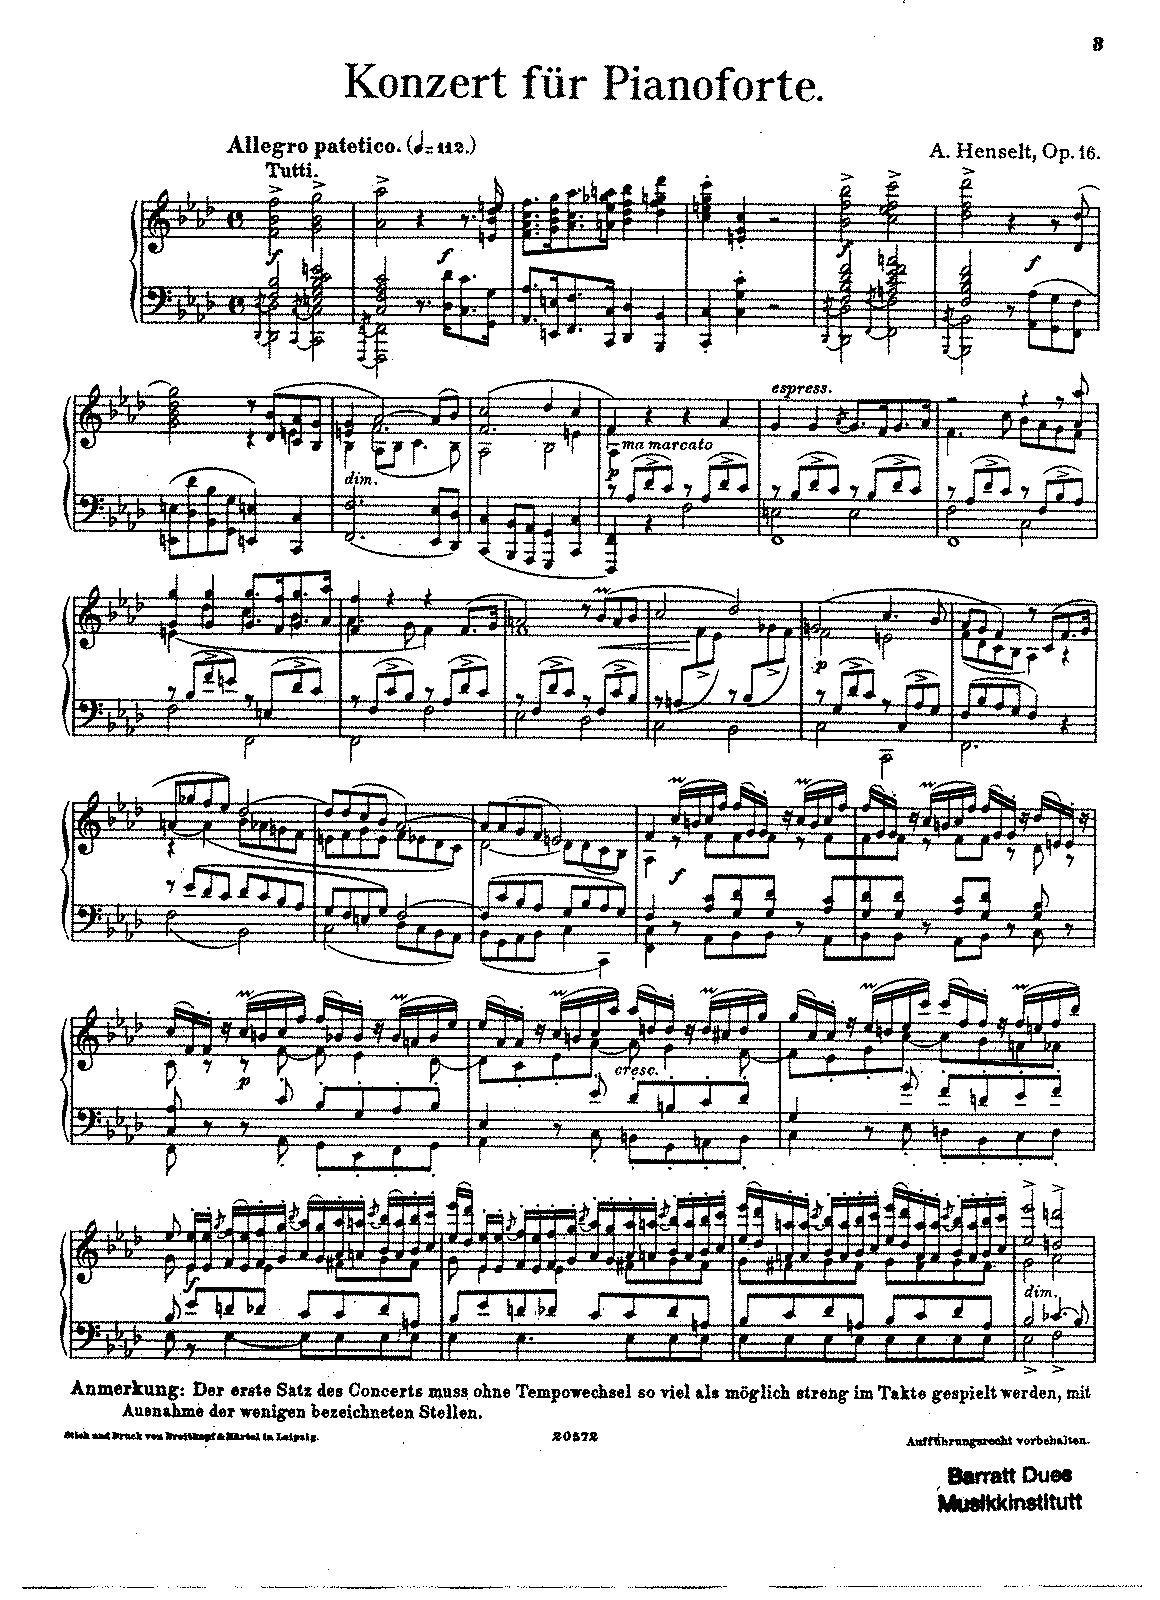 op. 16